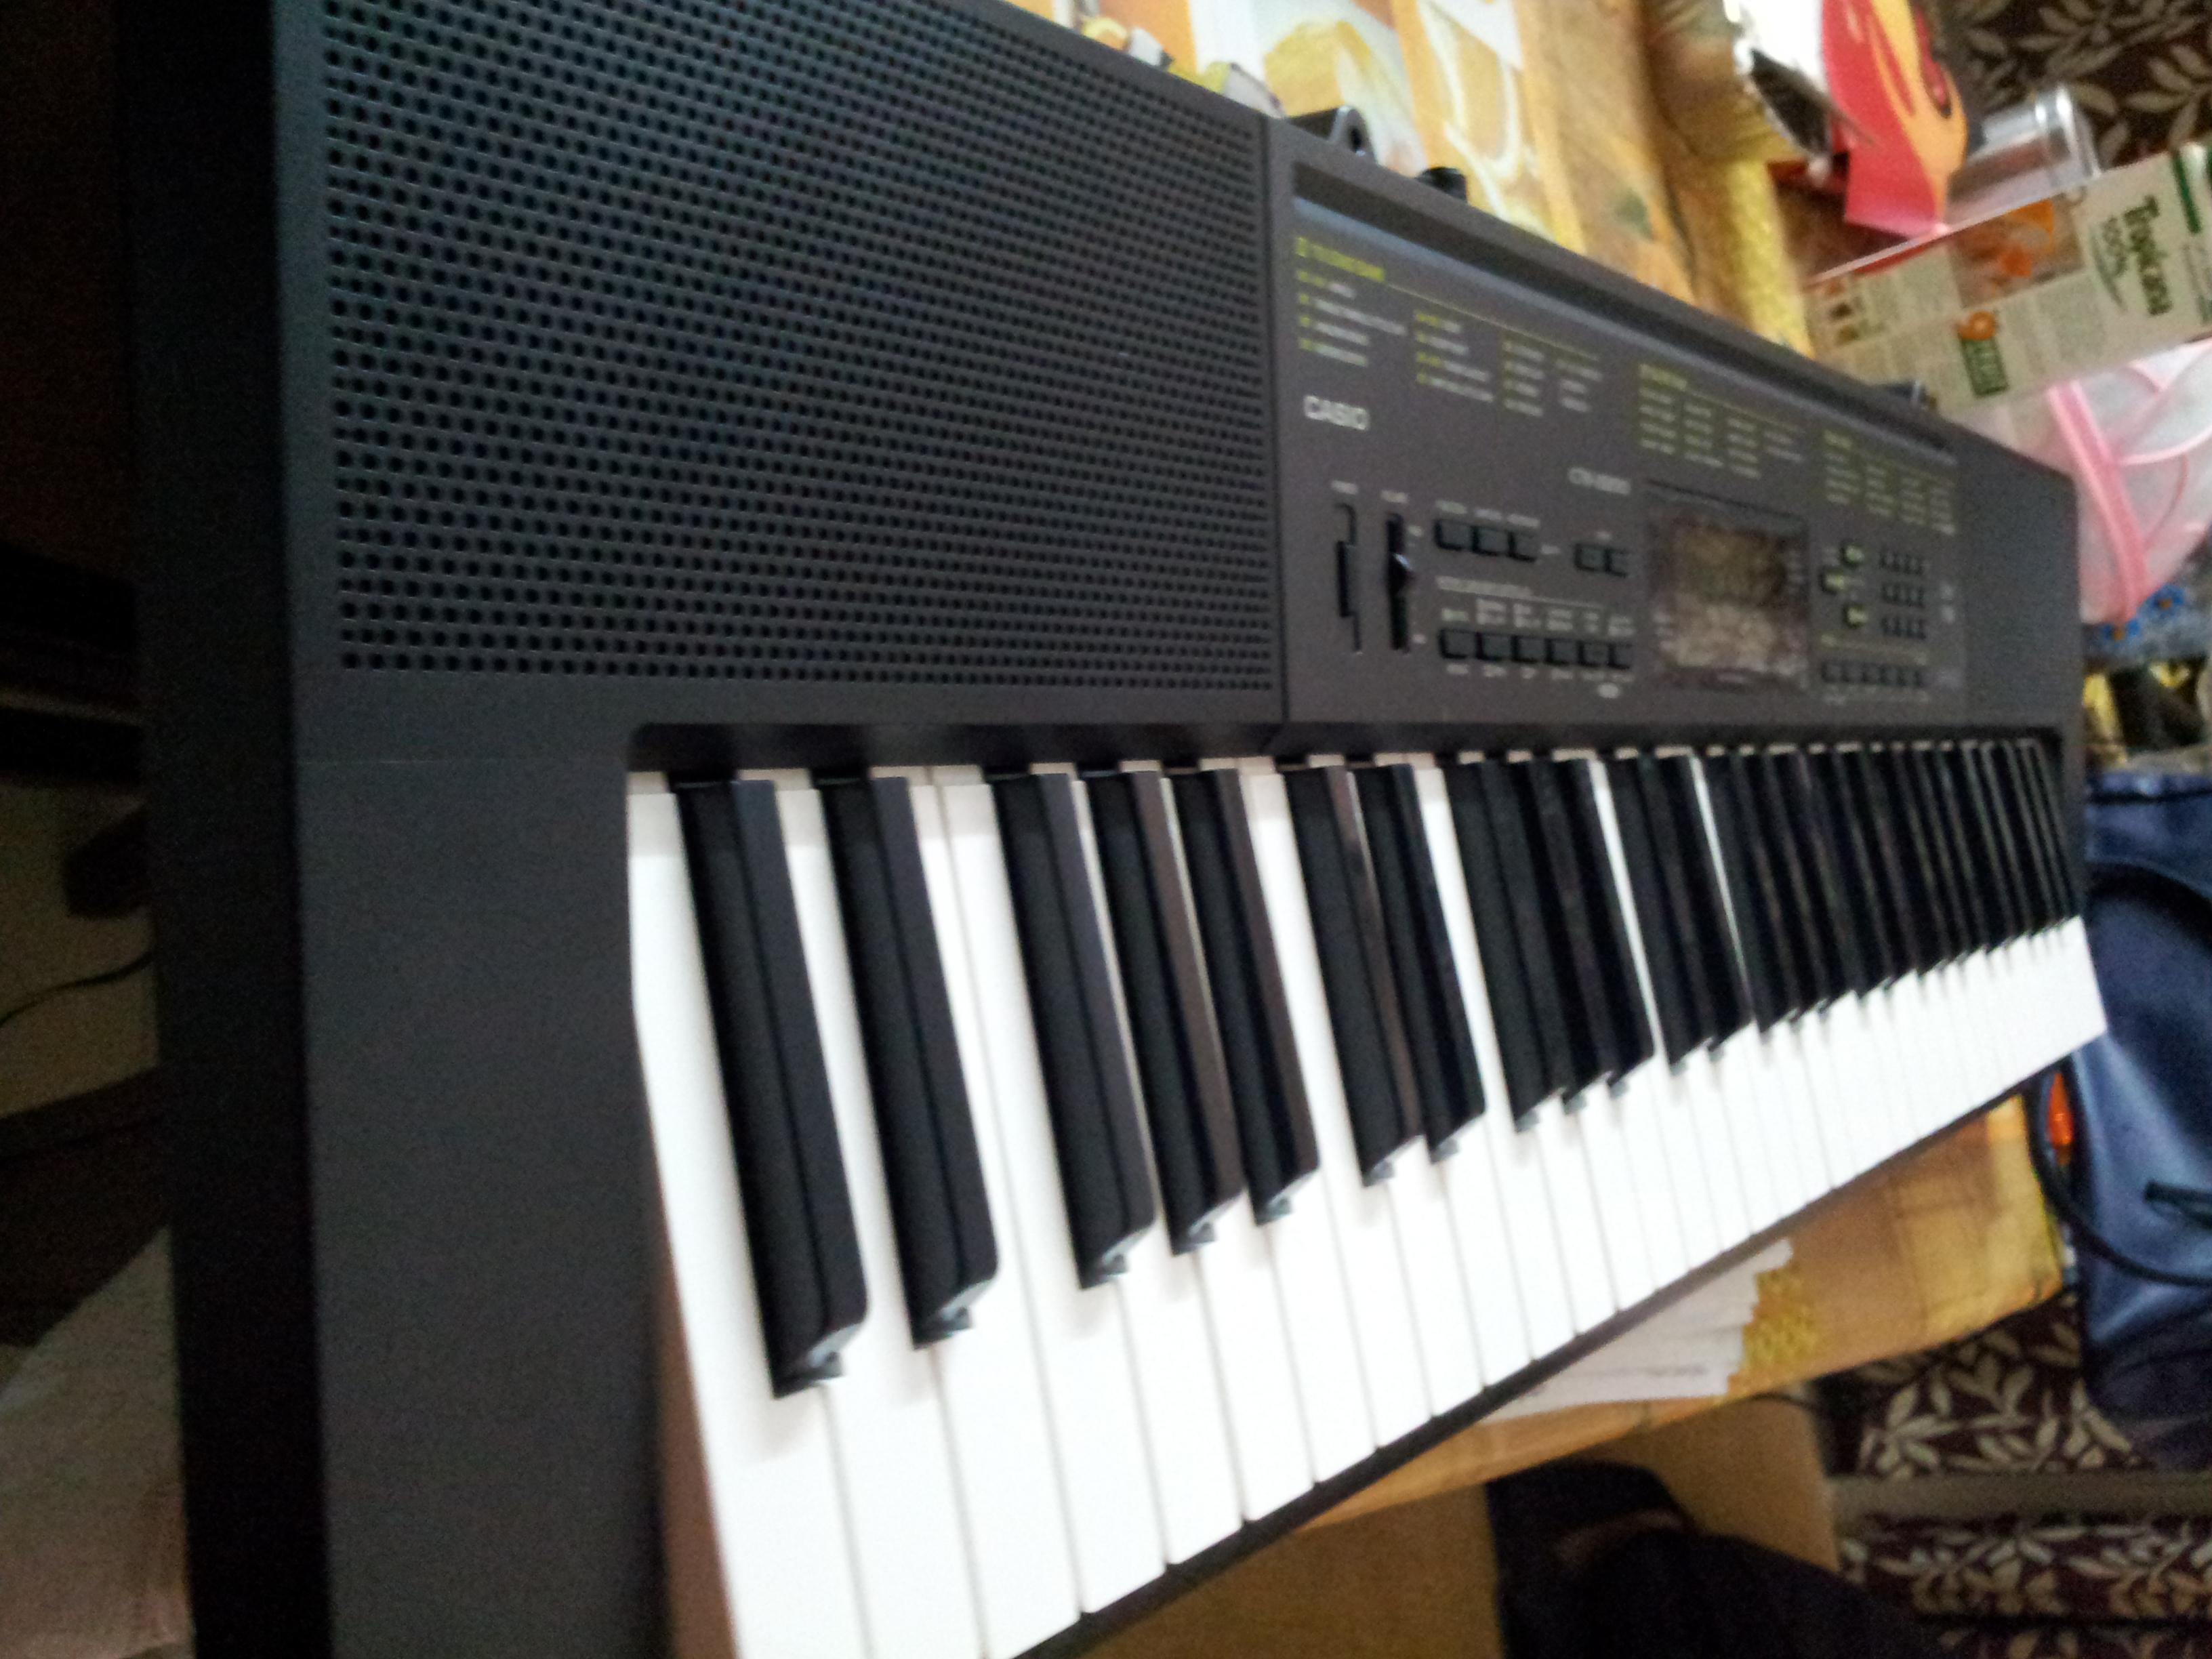 electronic piano keyboard yamaha f50. Black Bedroom Furniture Sets. Home Design Ideas